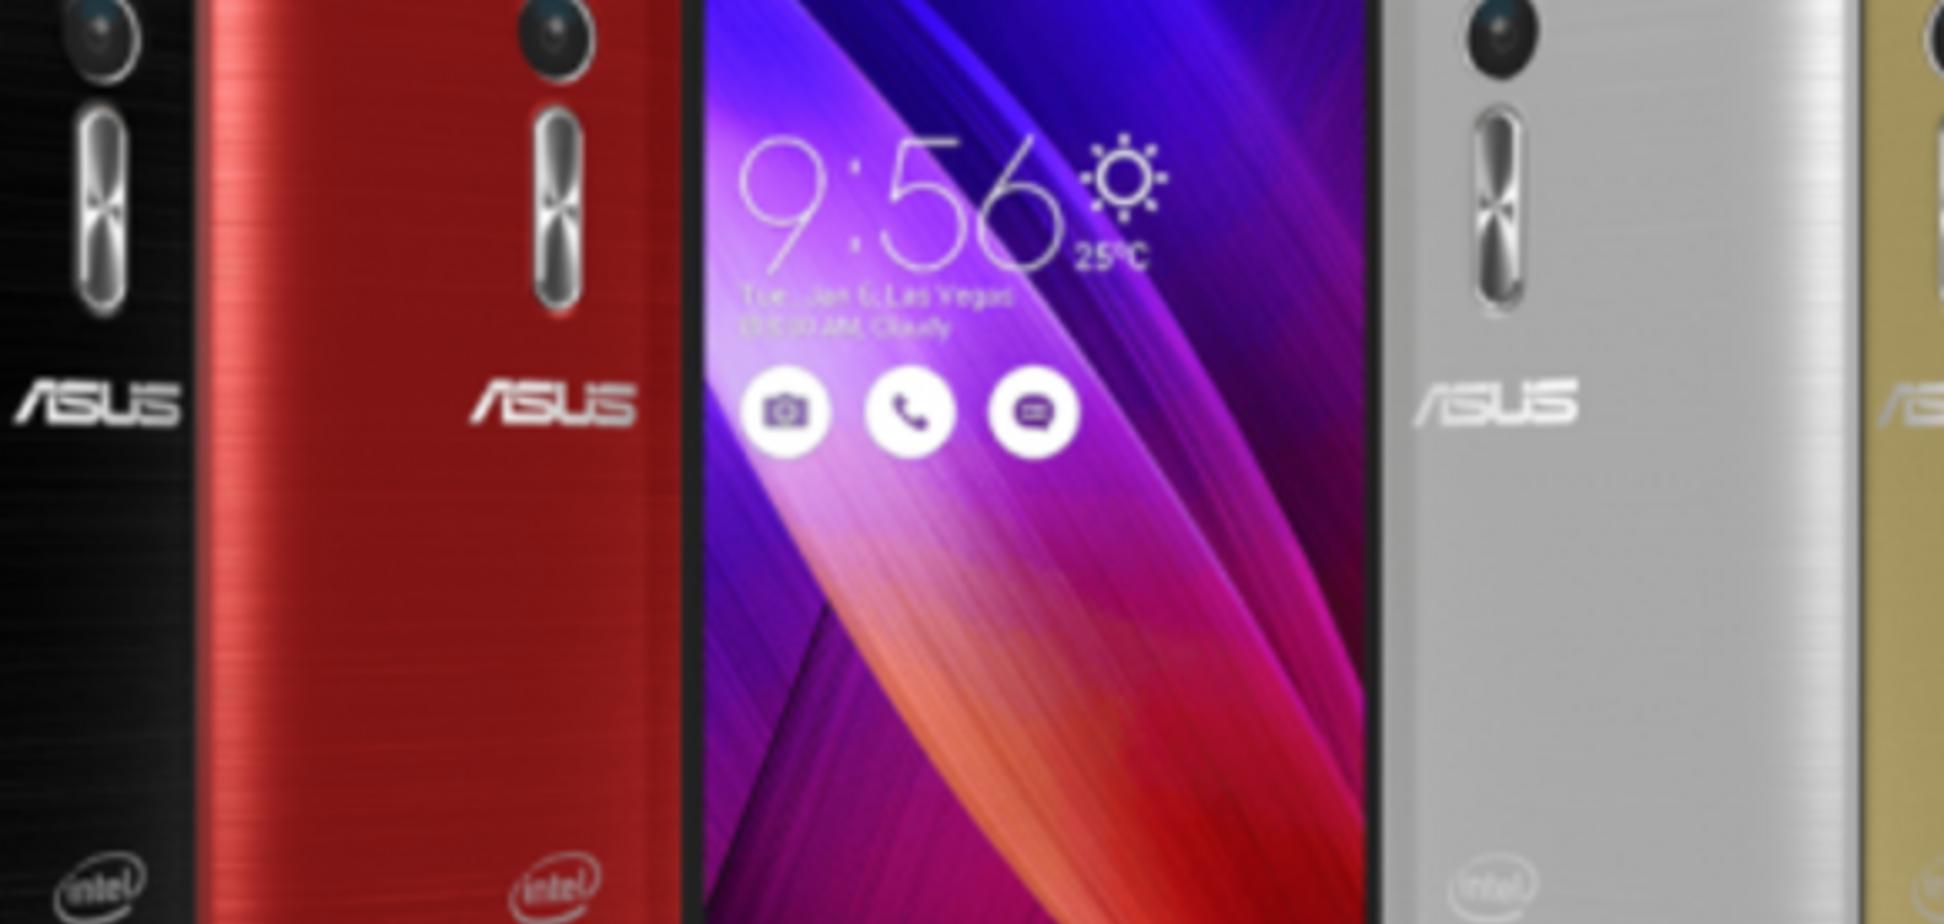 Представлен первый в мире смартфон с 4 ГБ ОЗУ за $200